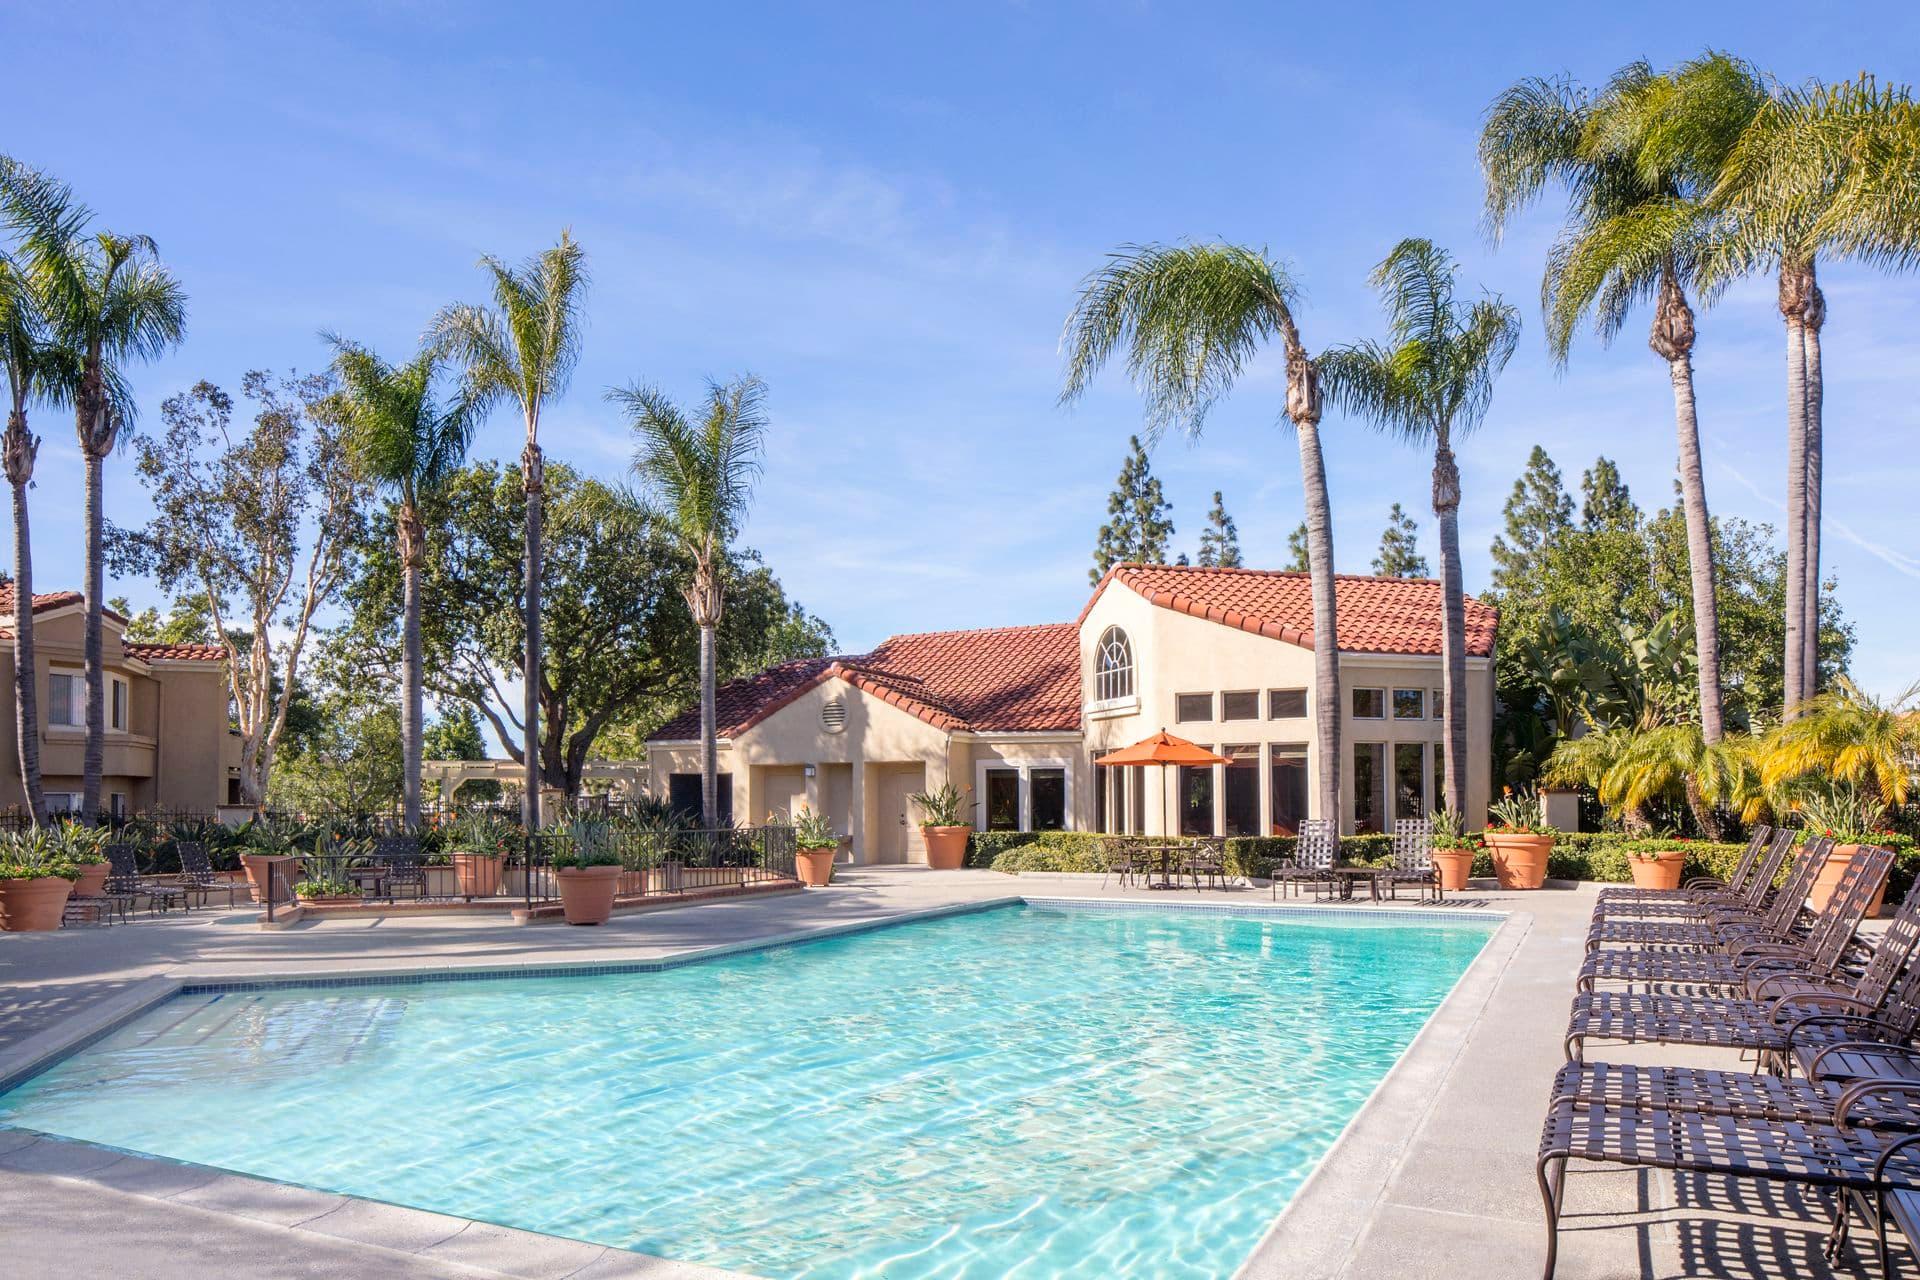 Pool view at San Marino Villa Apartment Communities in Irvine, CA.